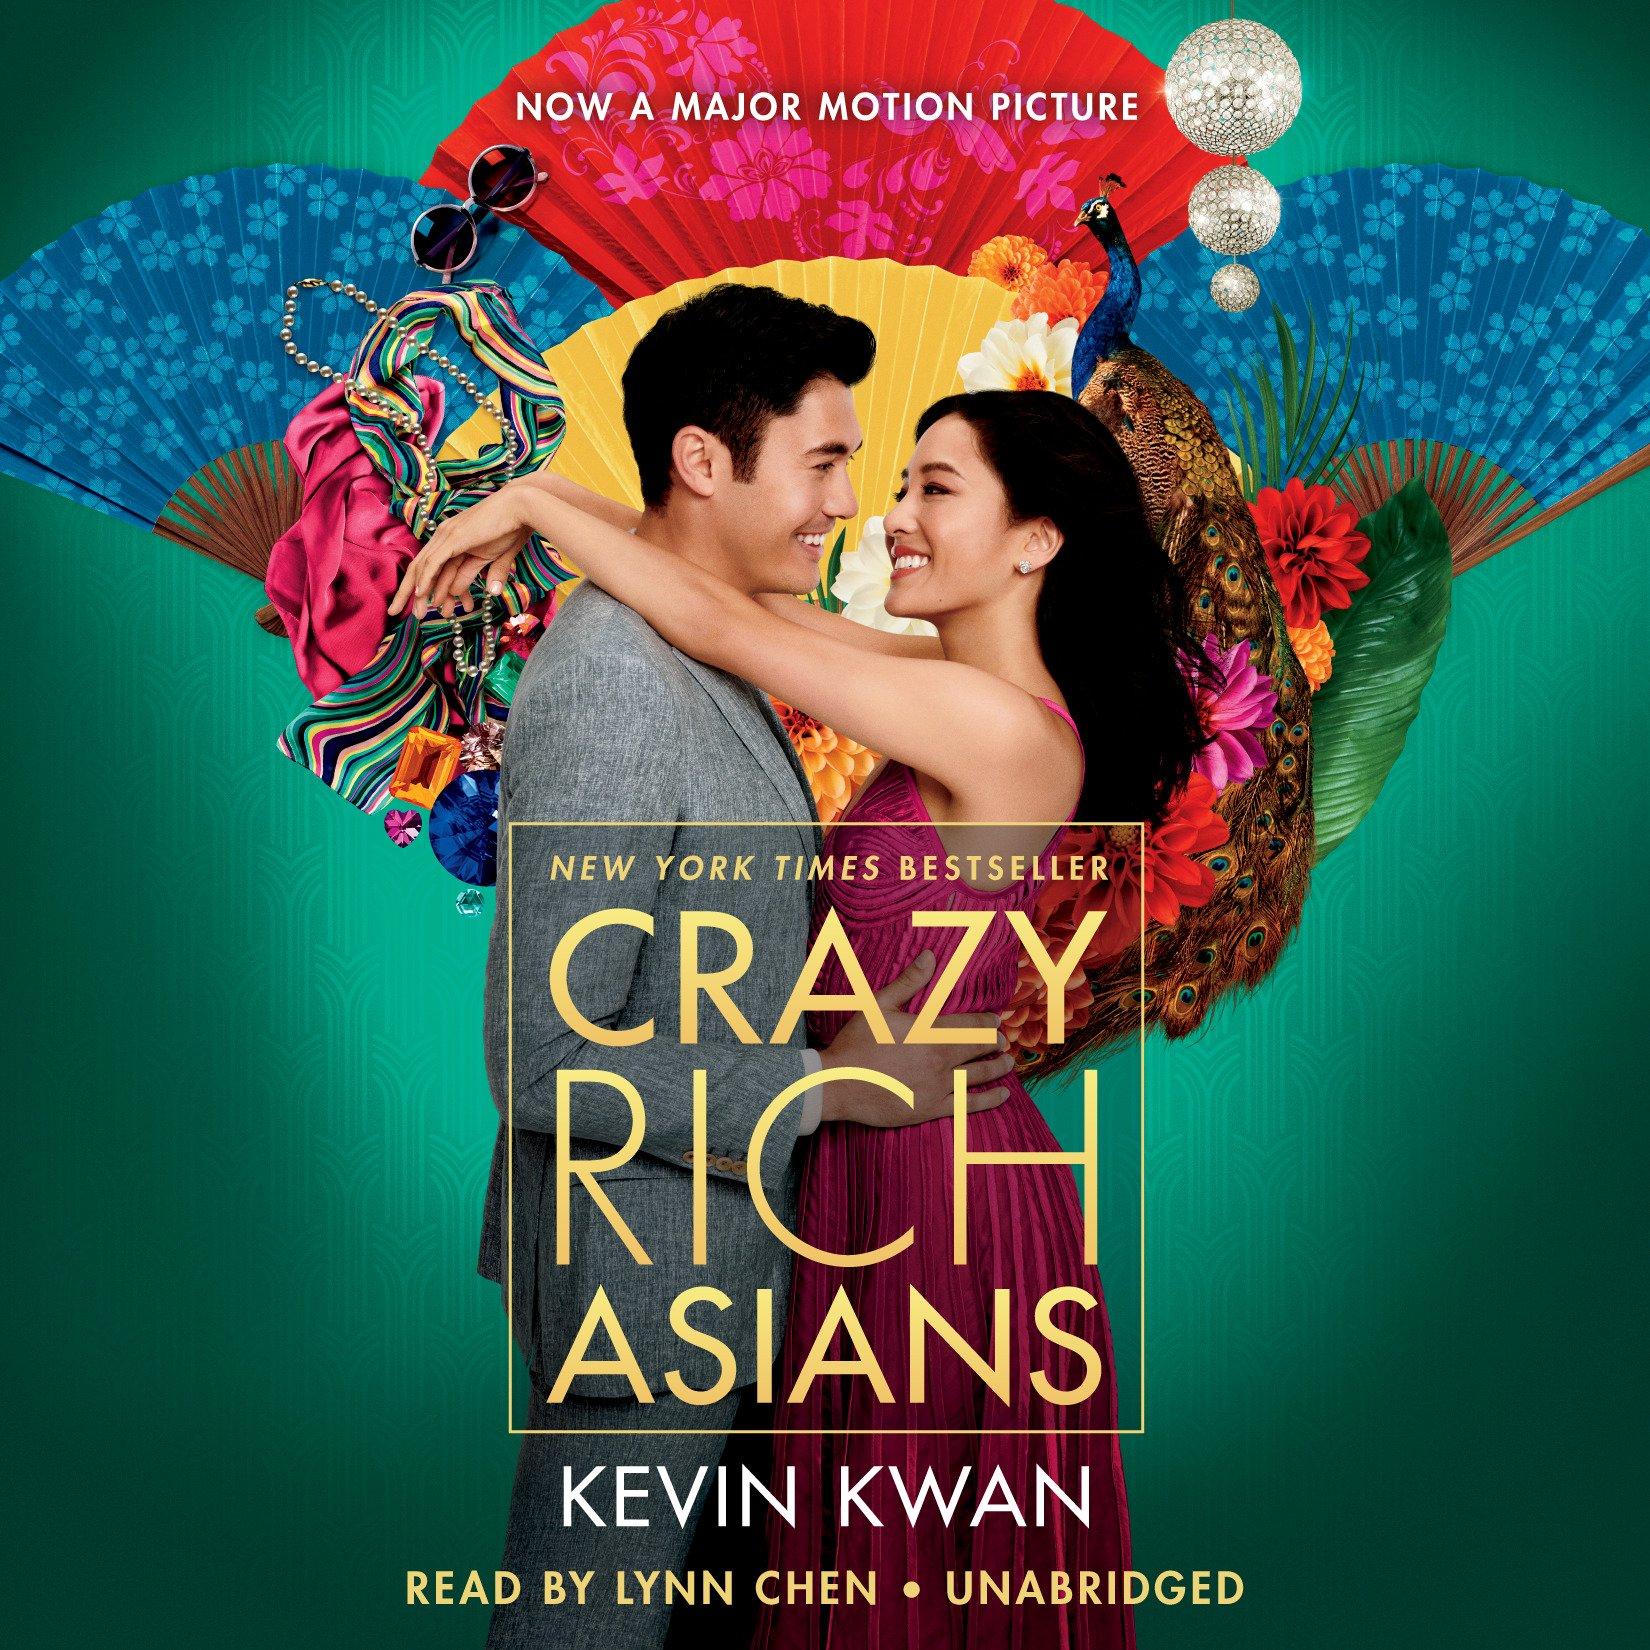 Crazy Rich Asians (Movie Tie-In Edition) (Crazy Rich Asians Trilogy): Kevin  Kwan, Lynn Chen: 9780525643593: Amazon.com: Books